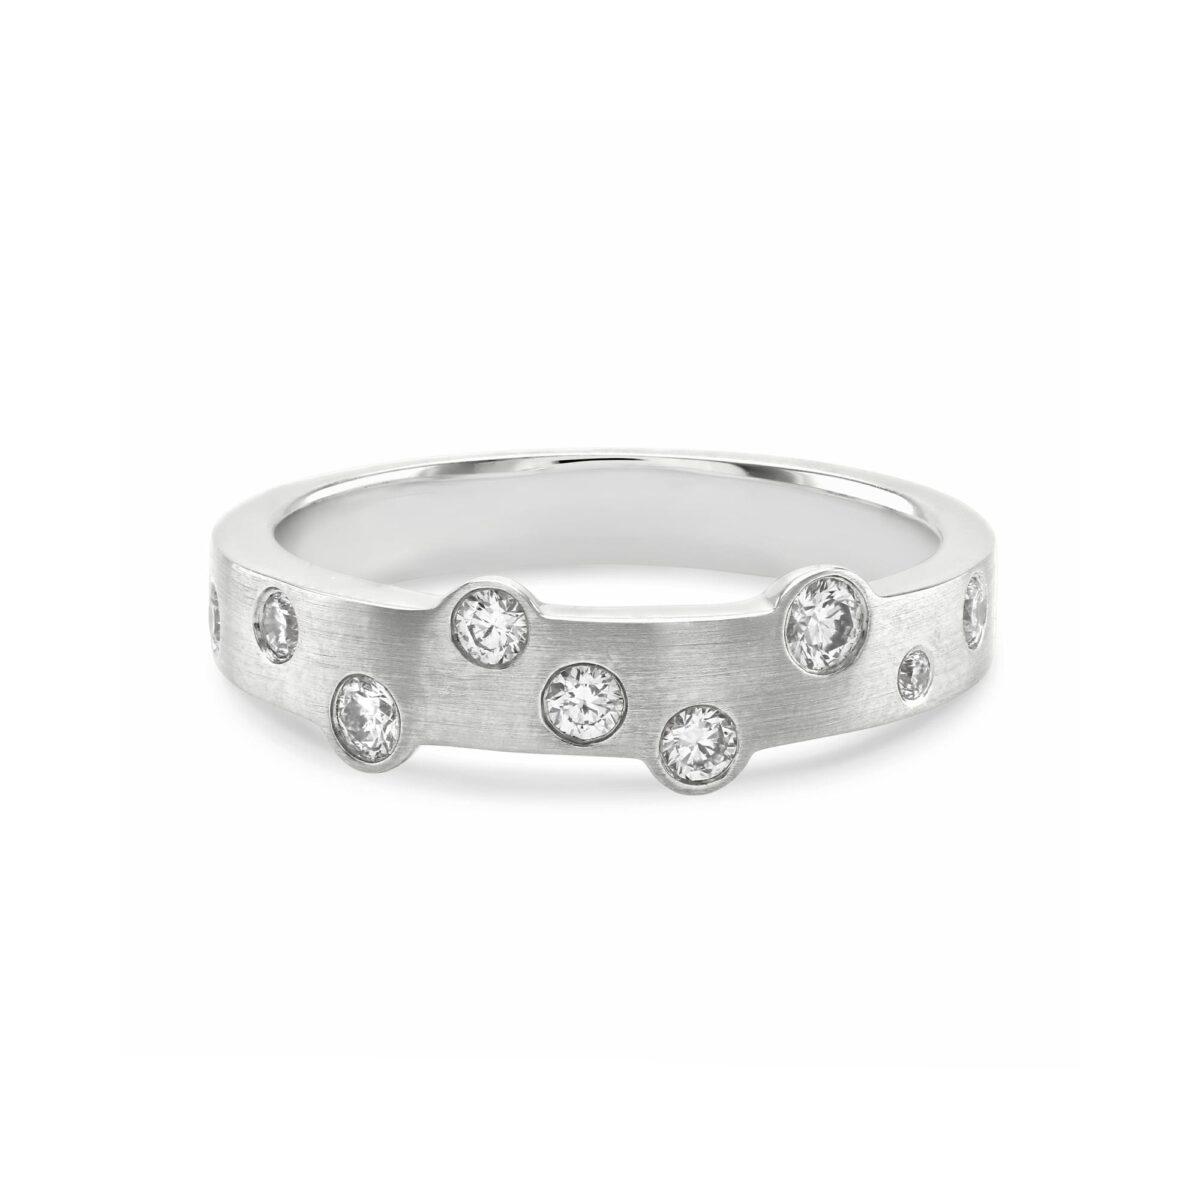 Cloud Nine White Gold Slim Diamond Ring